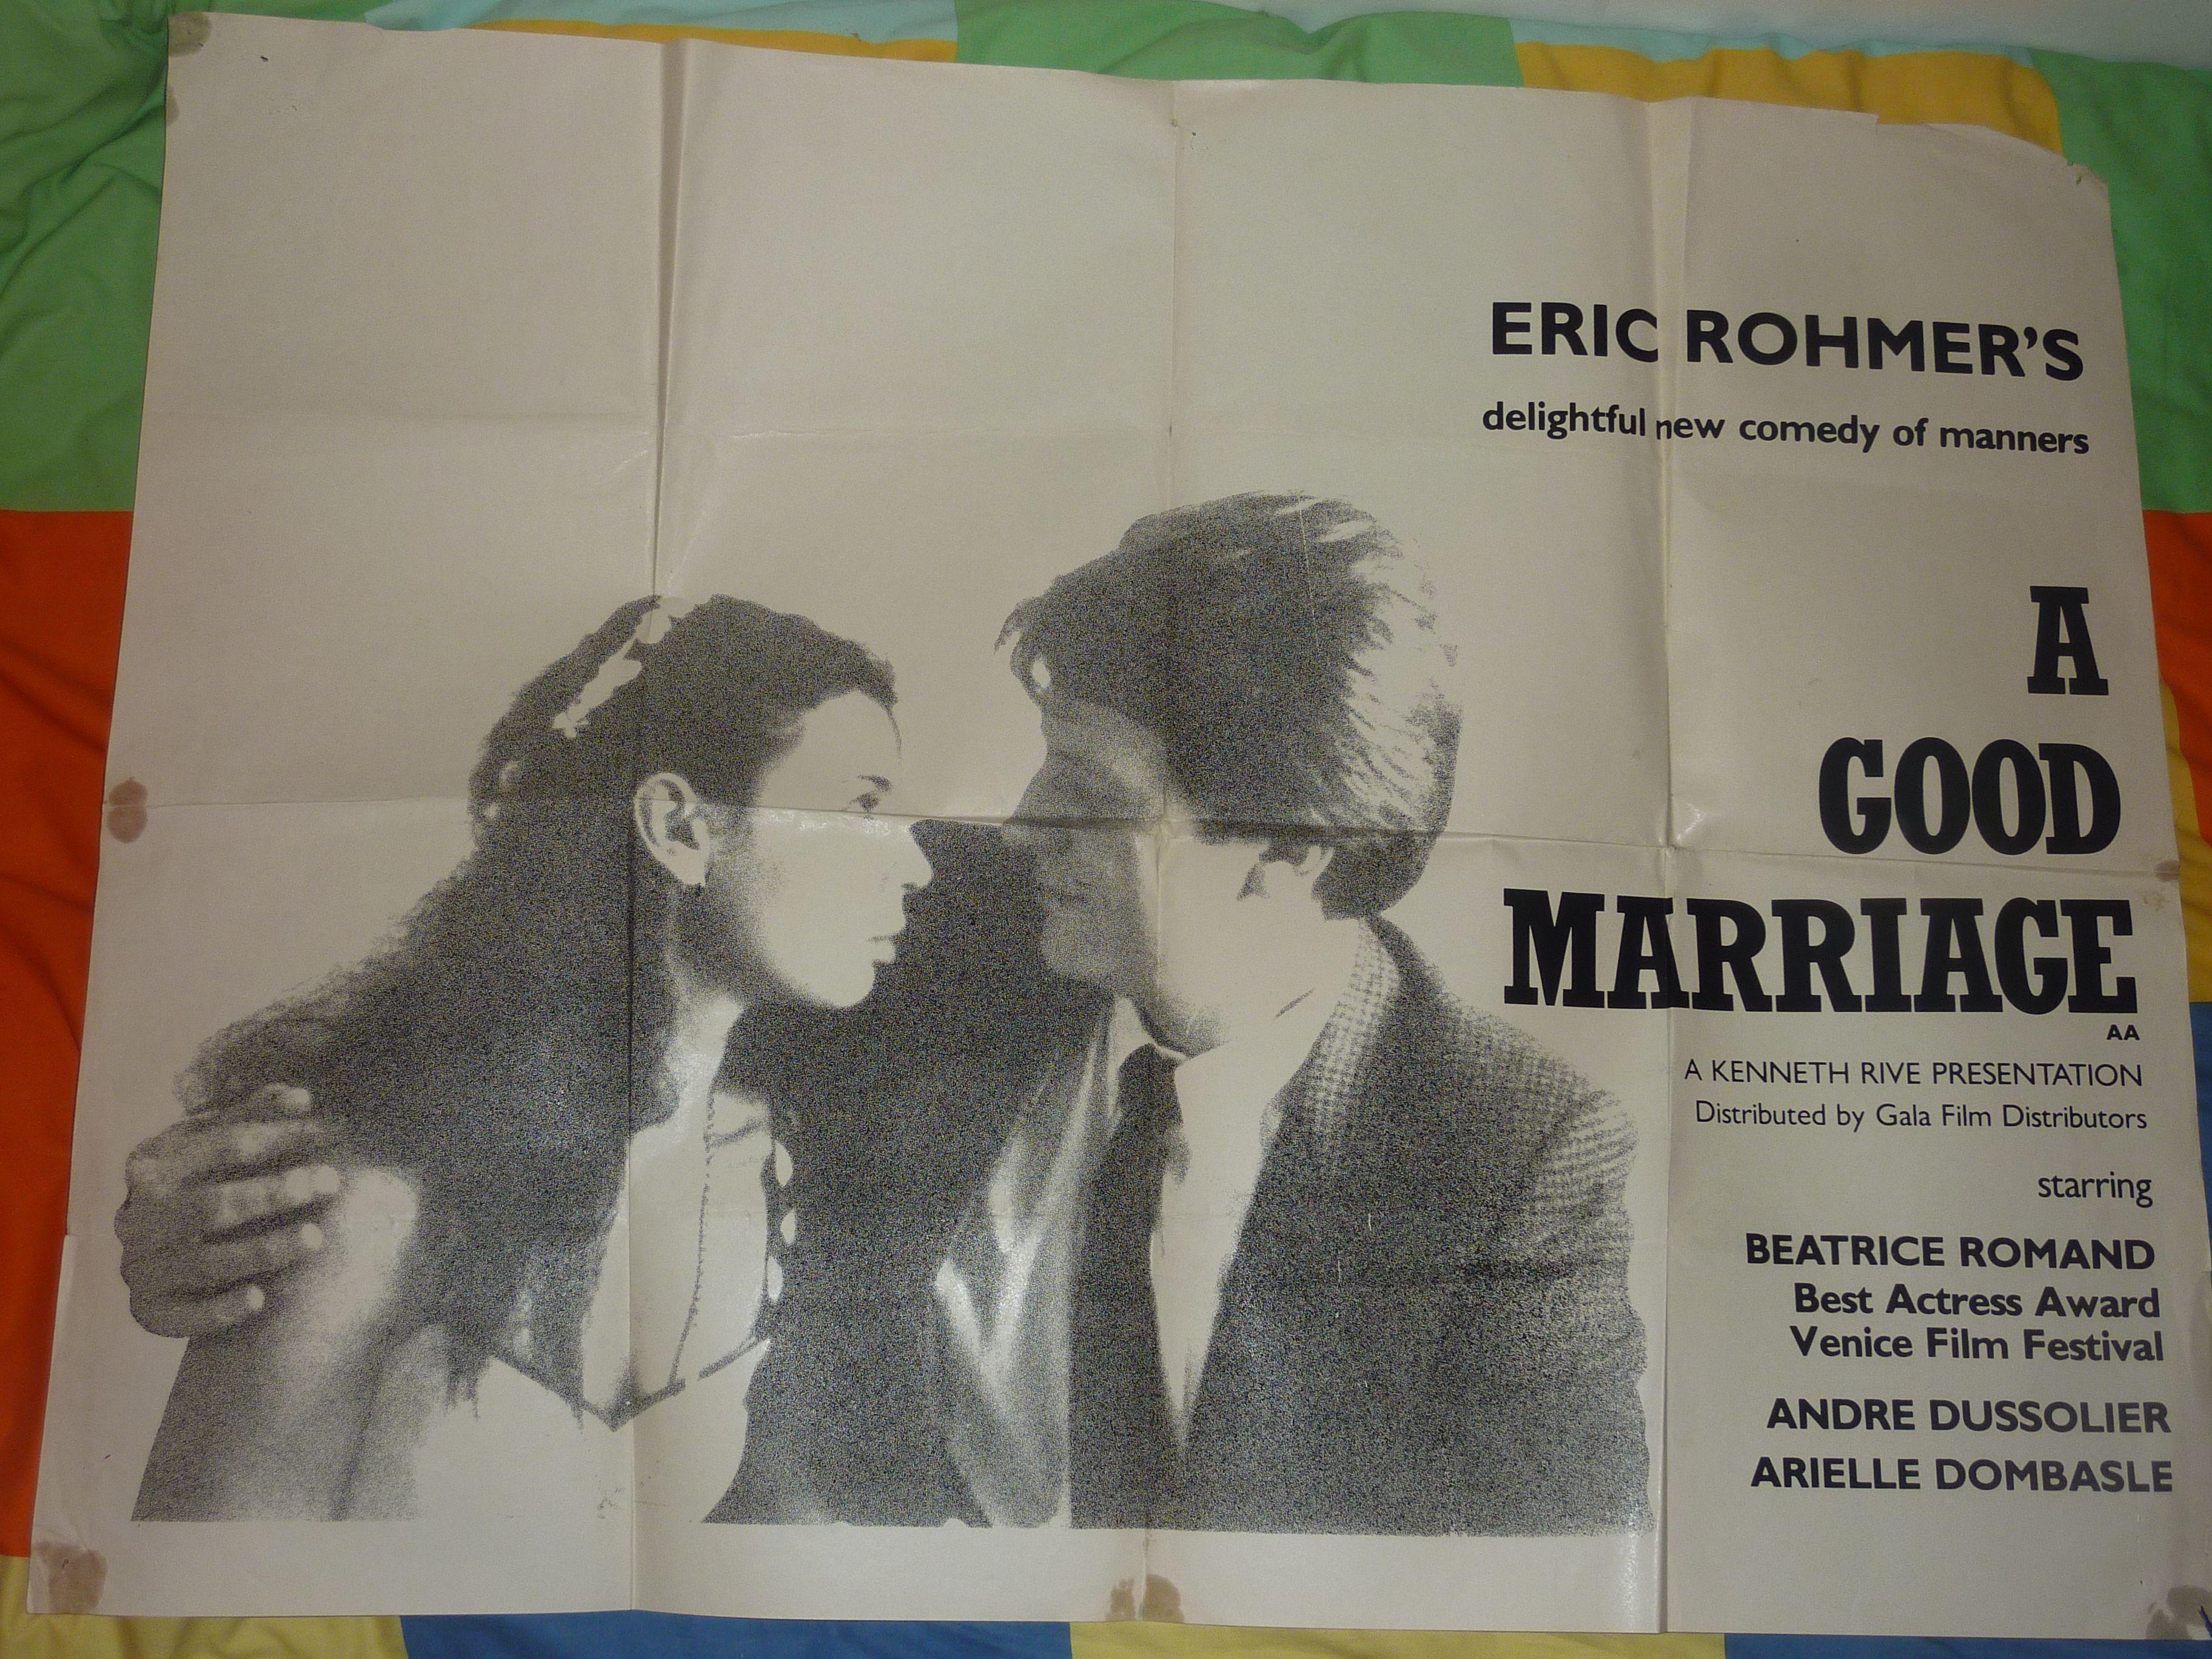 Uk Quad for A Good Marriage (1982). Director: Eric Rohmer  Stars: Béatrice Romand, André Dussollier, Féodor Atkine